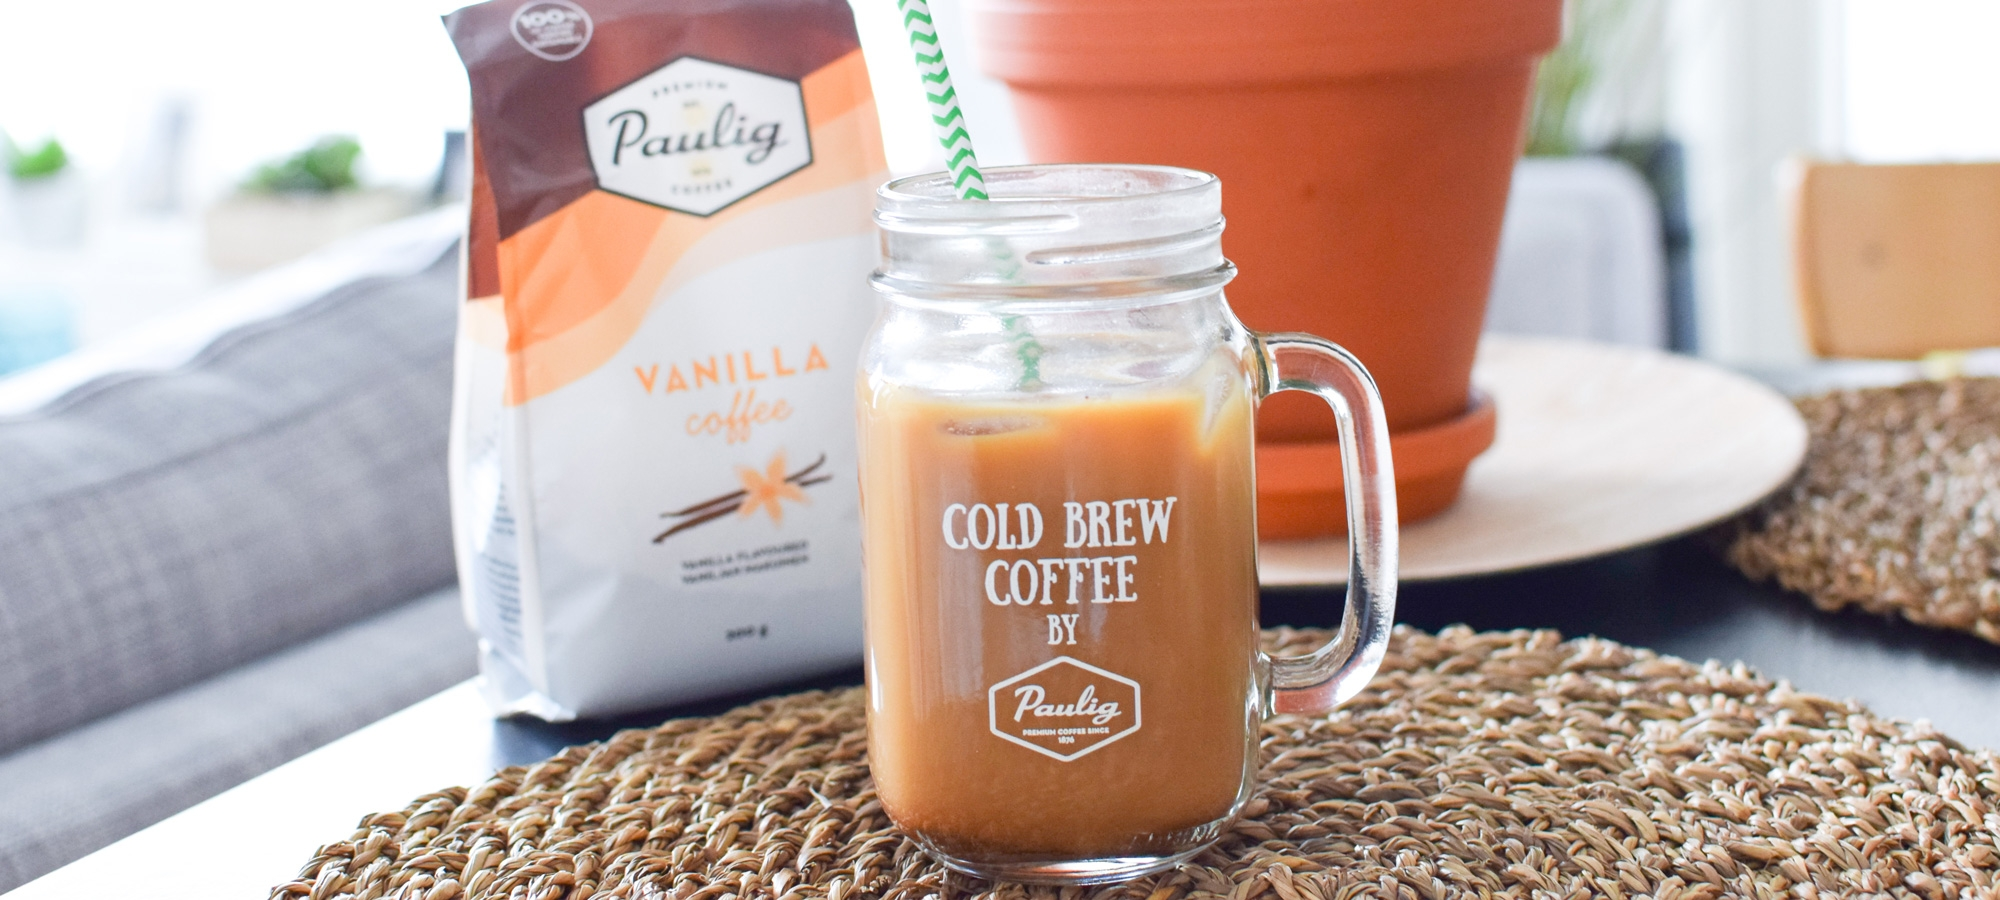 Cold Brew -kahvi Paulig Vanilla Coffee